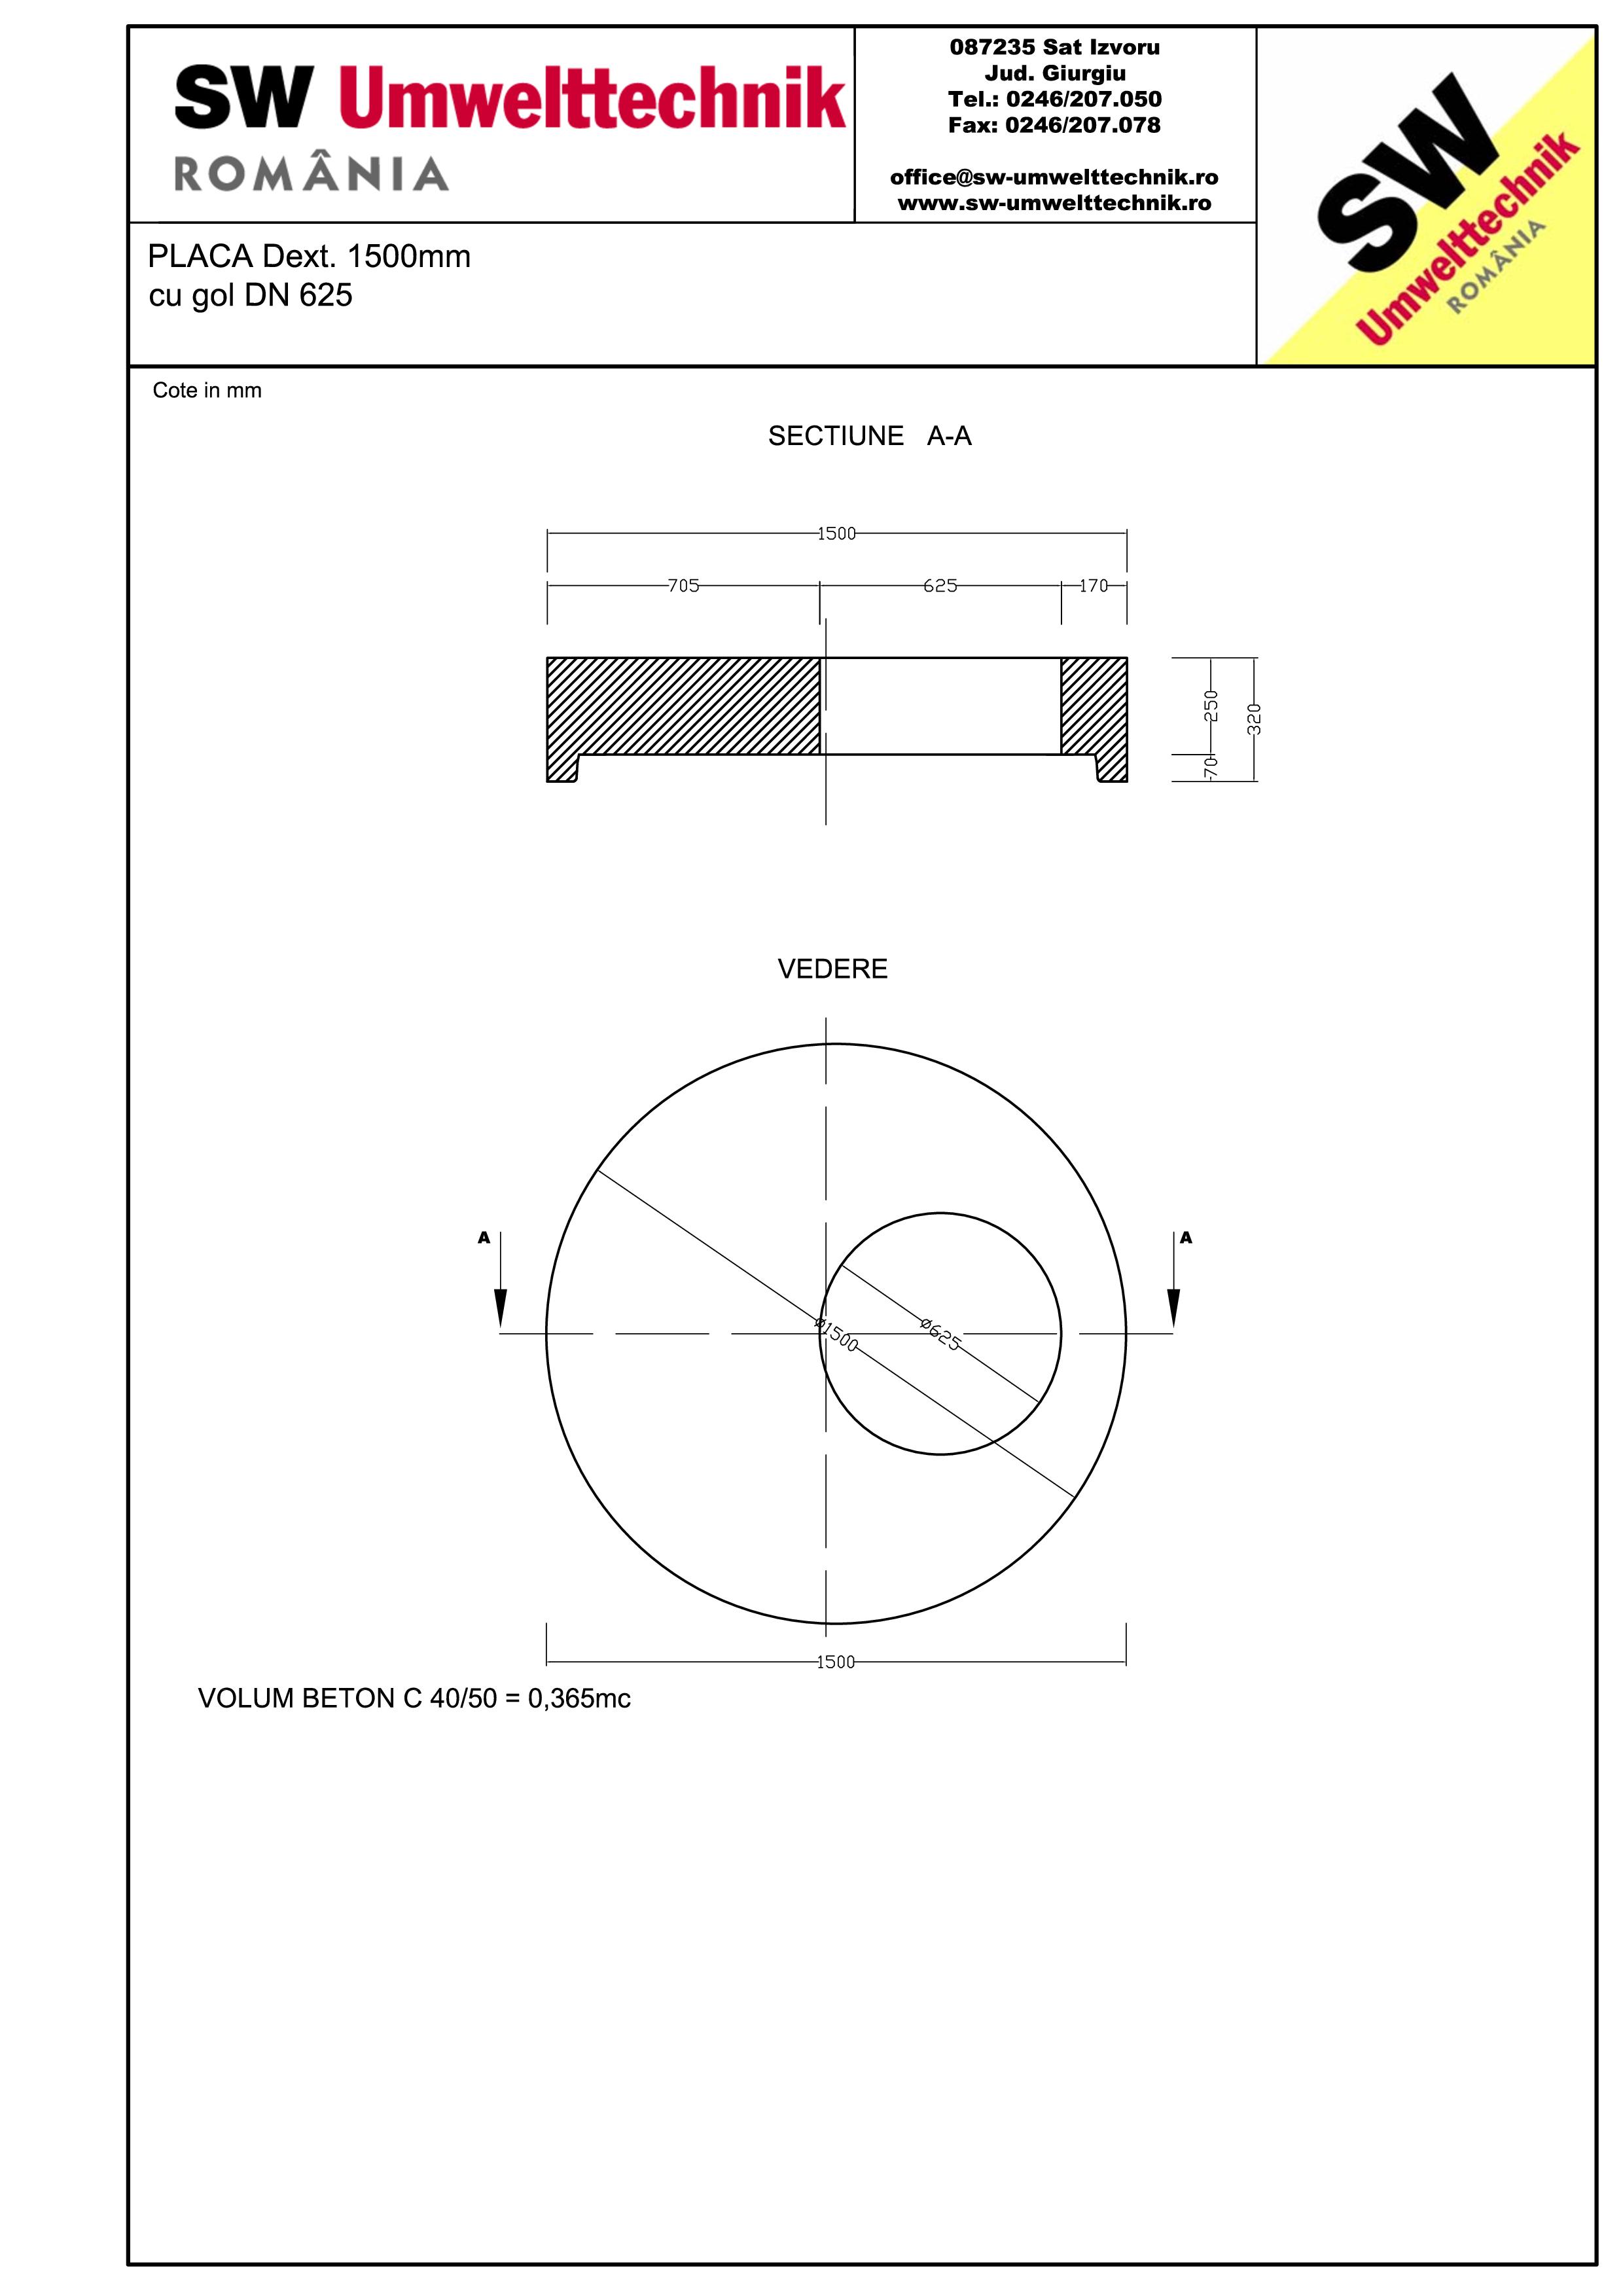 Pagina 1 - CAD-PDF Placa Dext.1500 H250 cu gol DN625 SW UMWELTTECHNIK Detaliu de produs